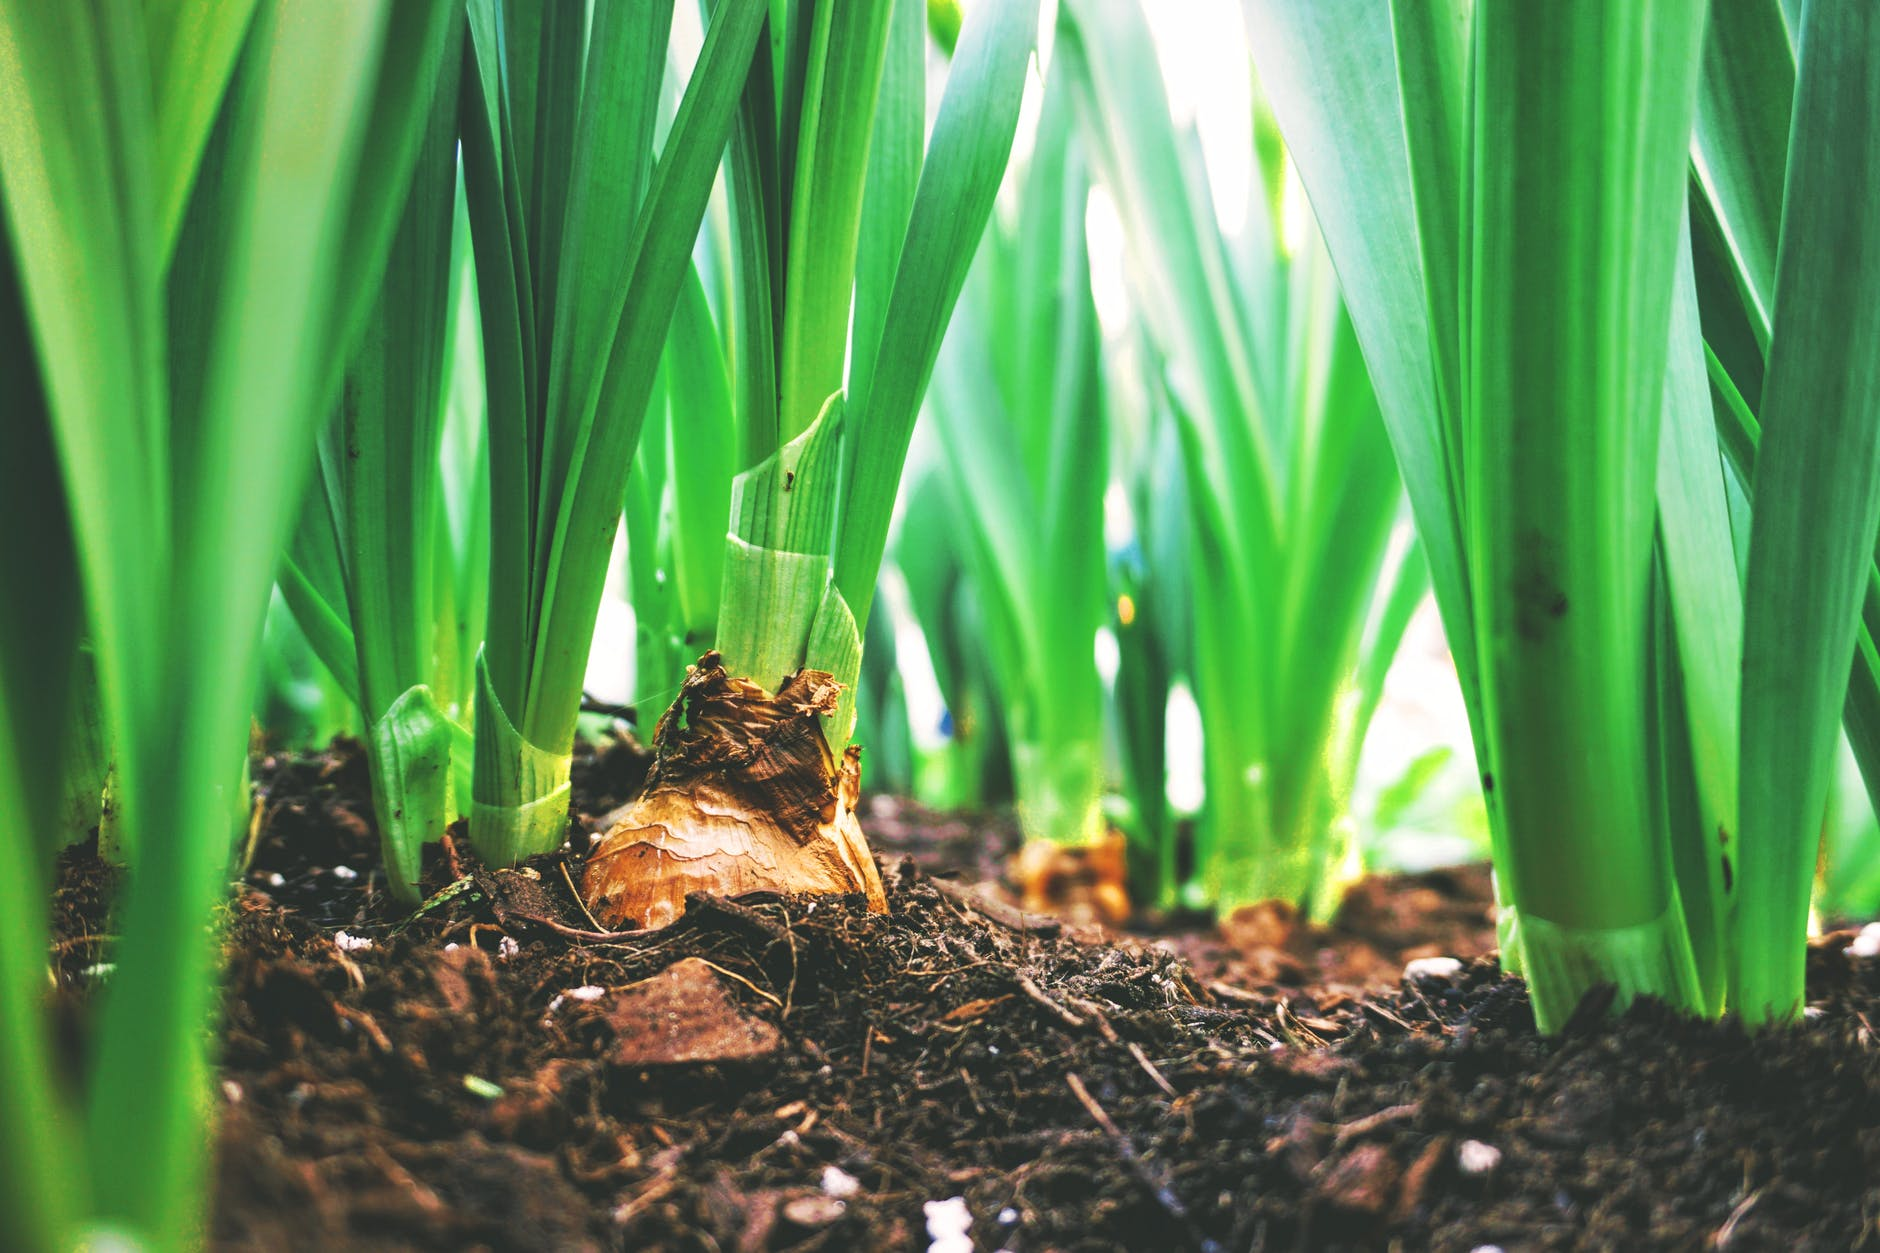 Ministarstvo poljoprivrede pozvalo na suradnju u izradi strateških dokumenata